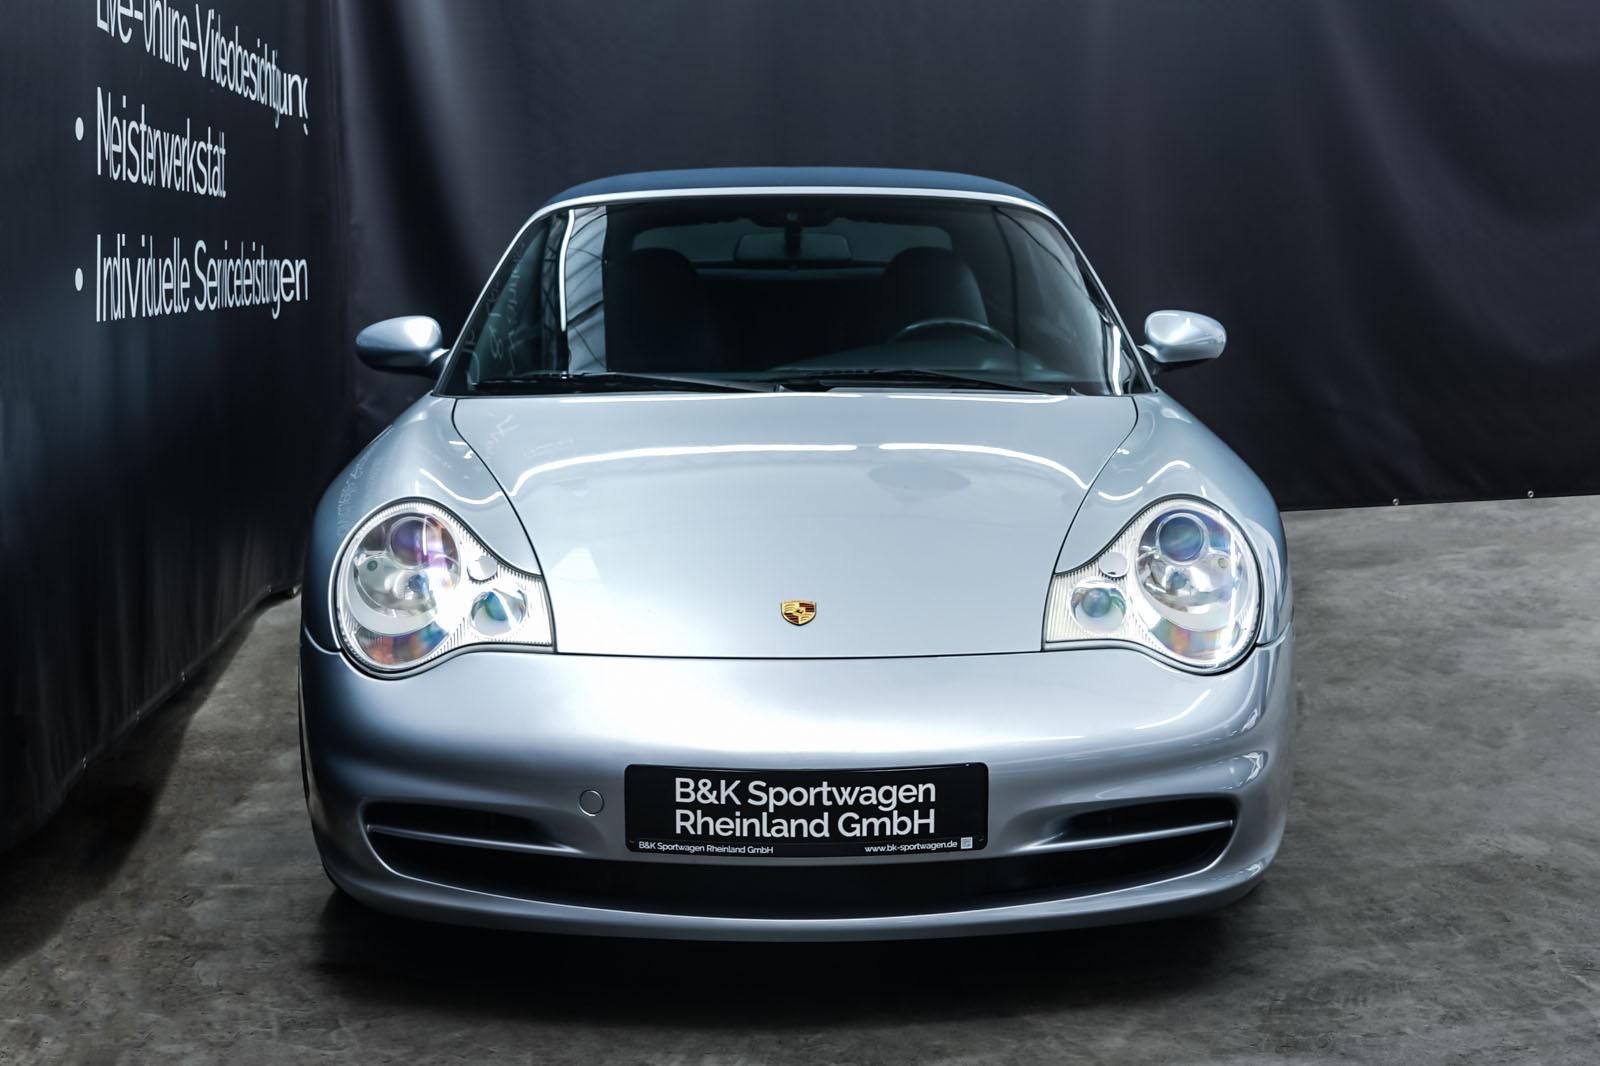 Porsche_996_Cabrio_Silber_Dunkelblau_POR-1724_1_w